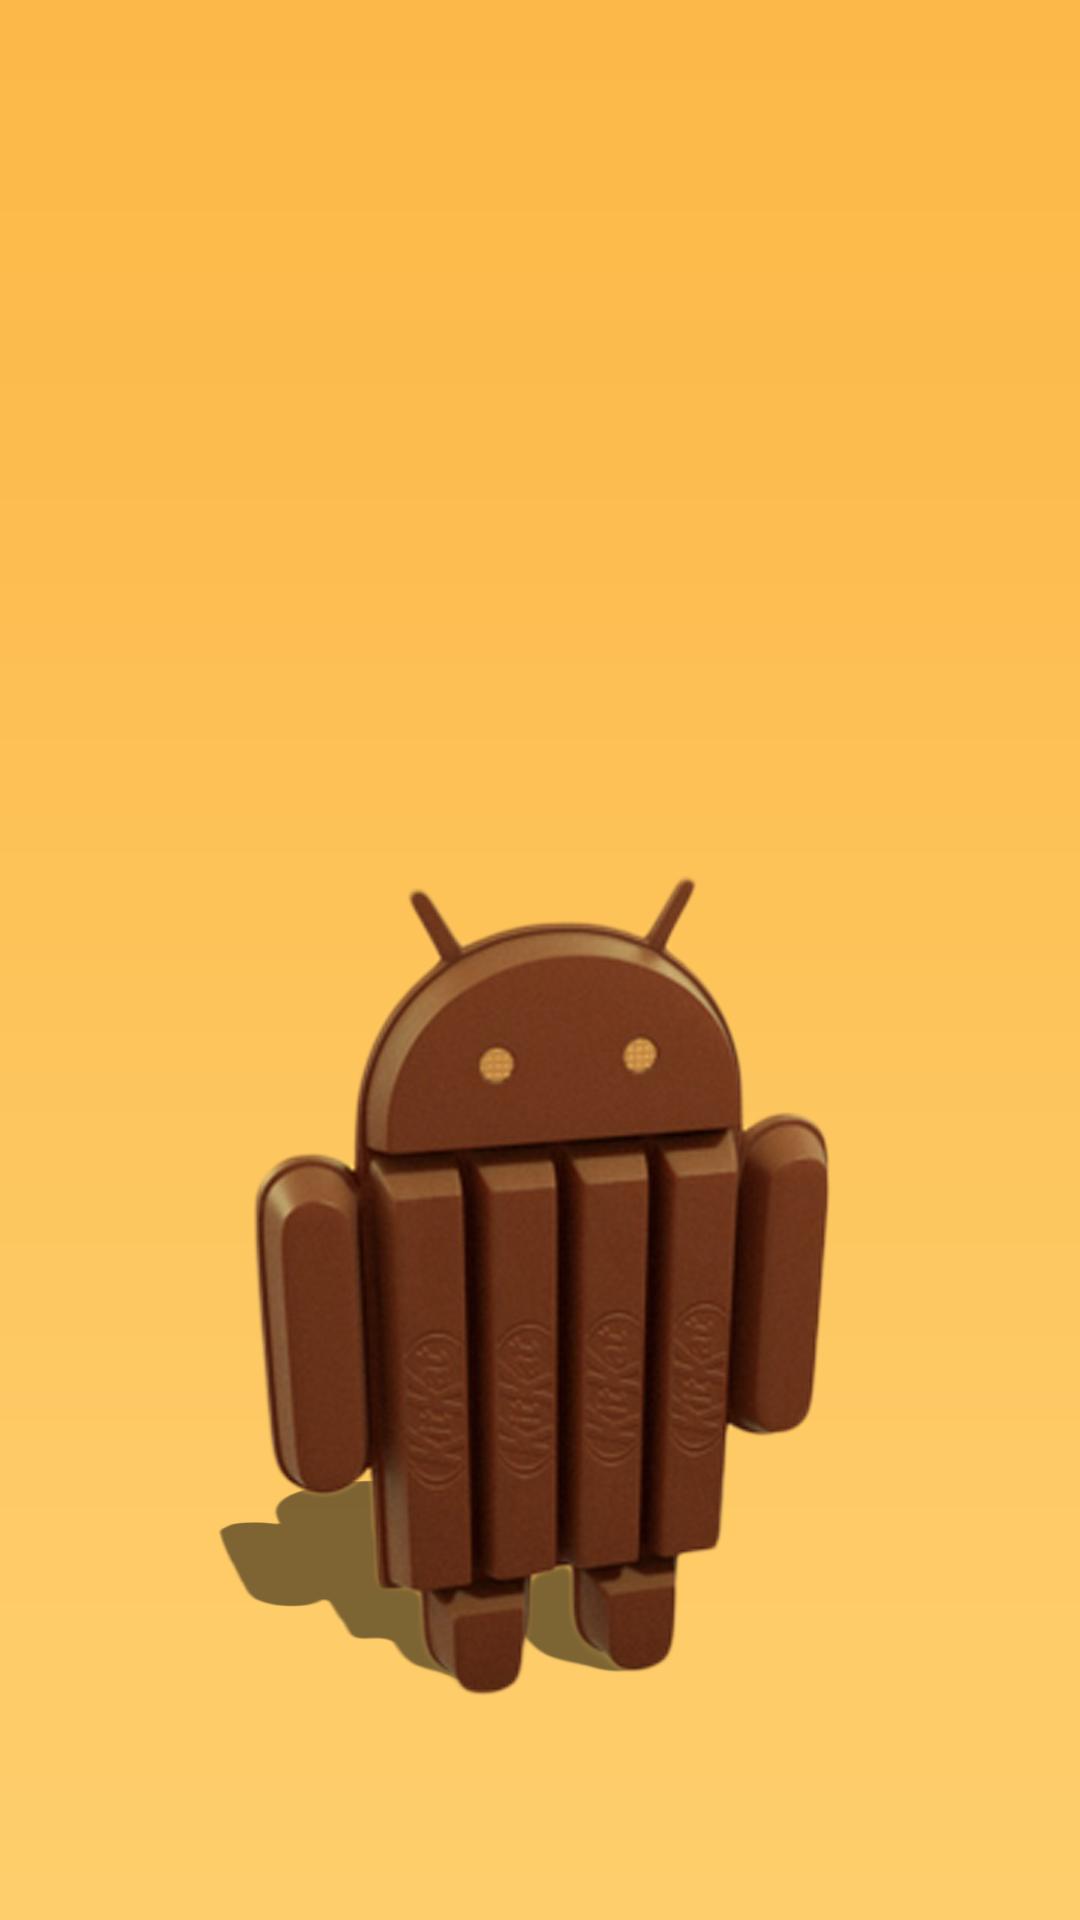 wallpaper sunday android kit kat edition